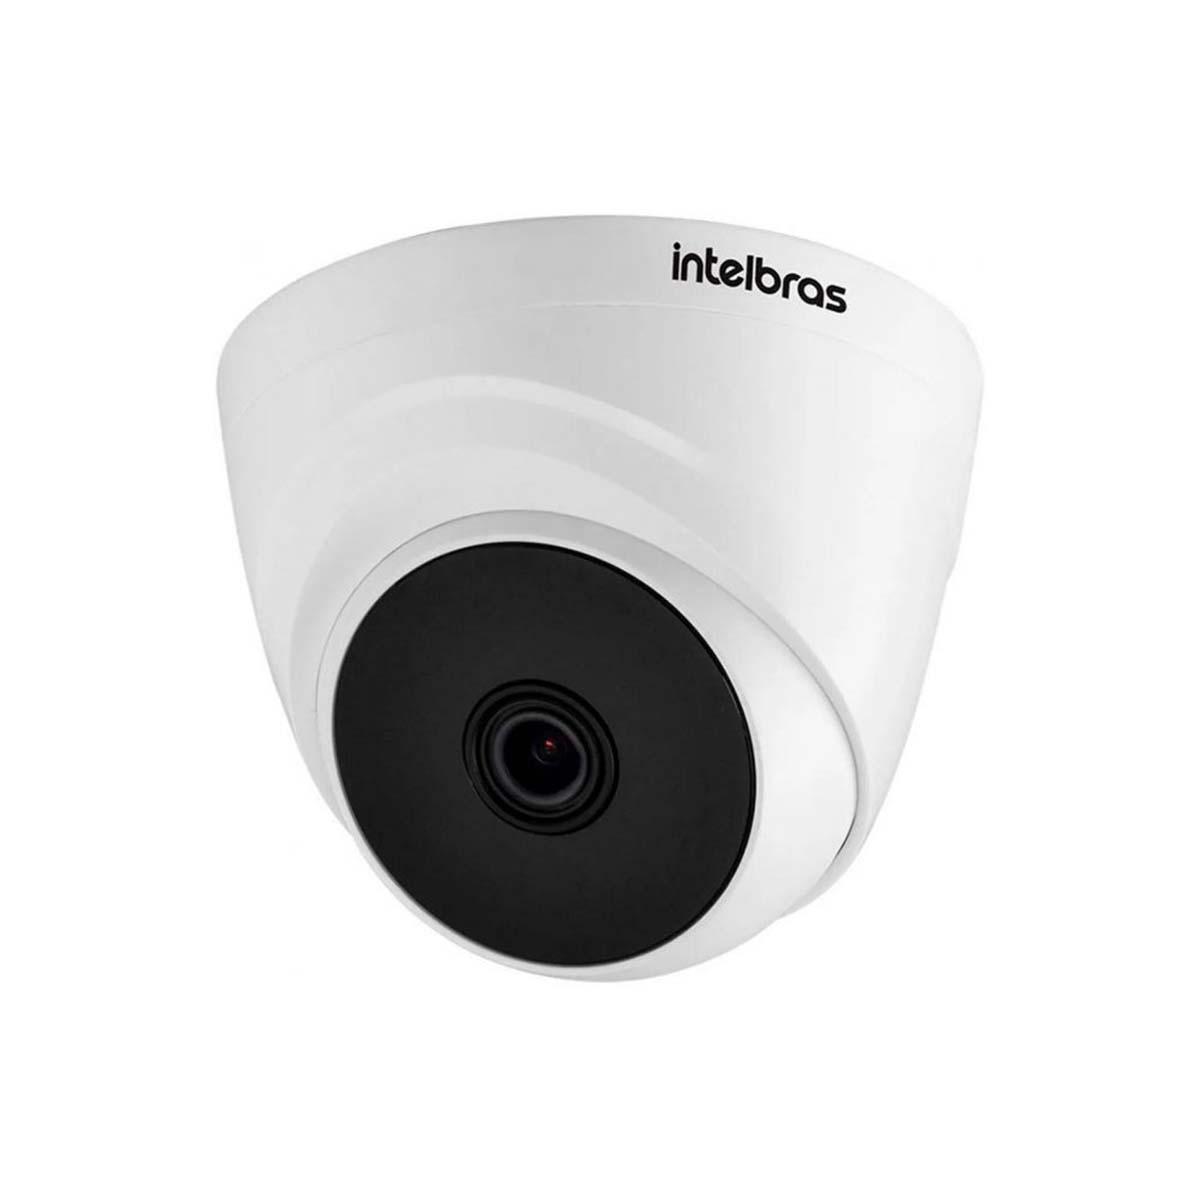 Kit 02 Câmera infravermelho Multi HD Intelbras VHD 1220 D G5 1080P Lente 2,8 mm